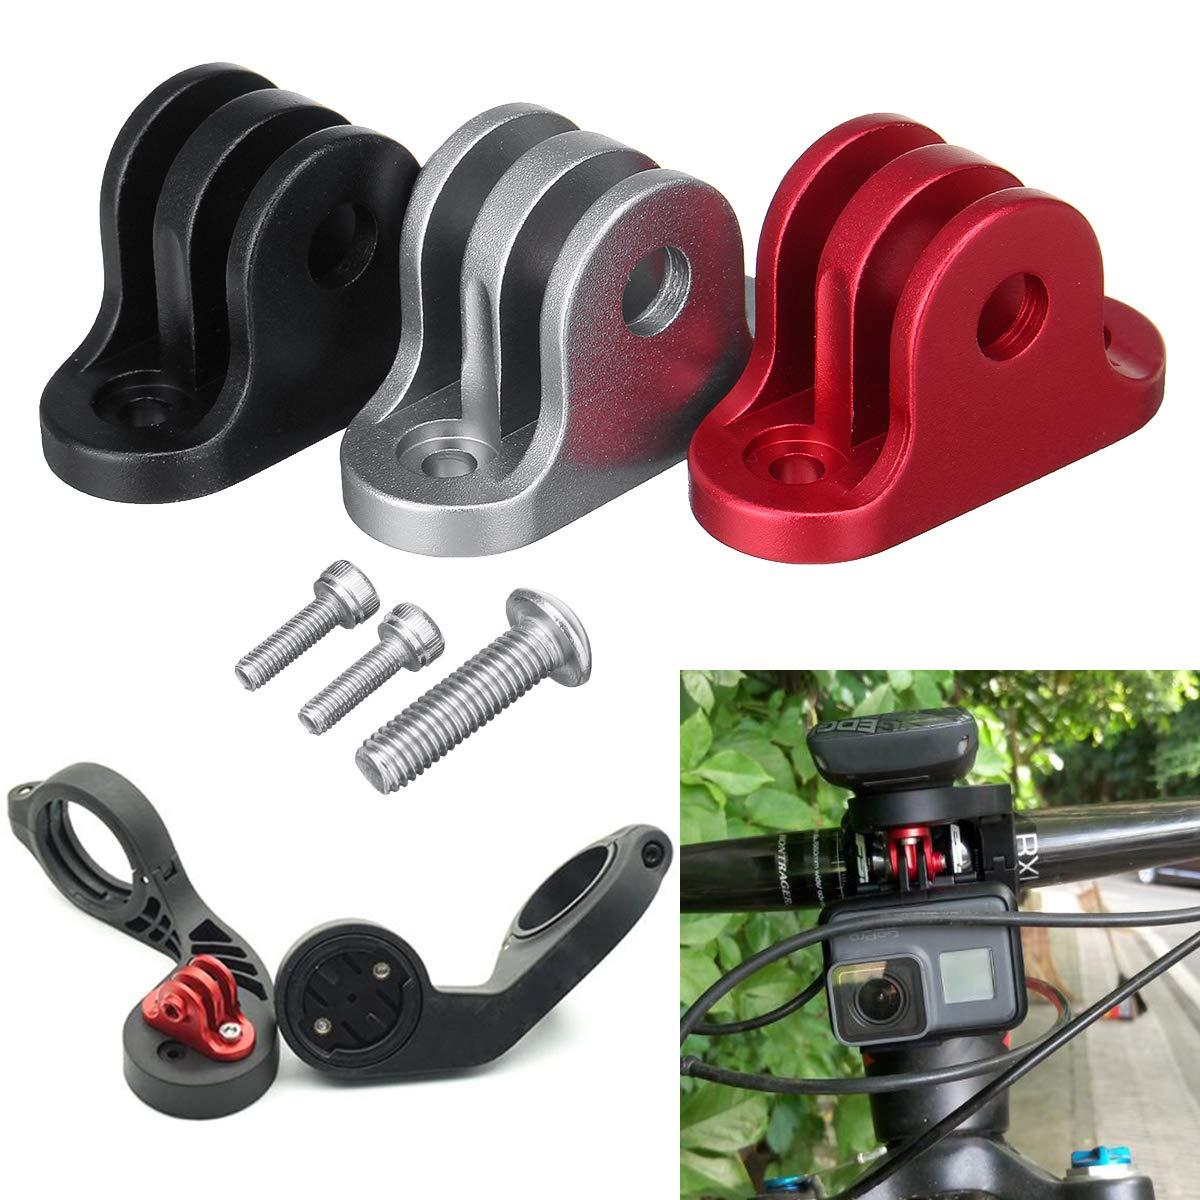 Pinkfishs BIKIGHT Bicicleta Manillar Ordenador Camara Montaje Adaptador Soporte para GoPro Garmin Edge/Bryton Ordenador - Rojo